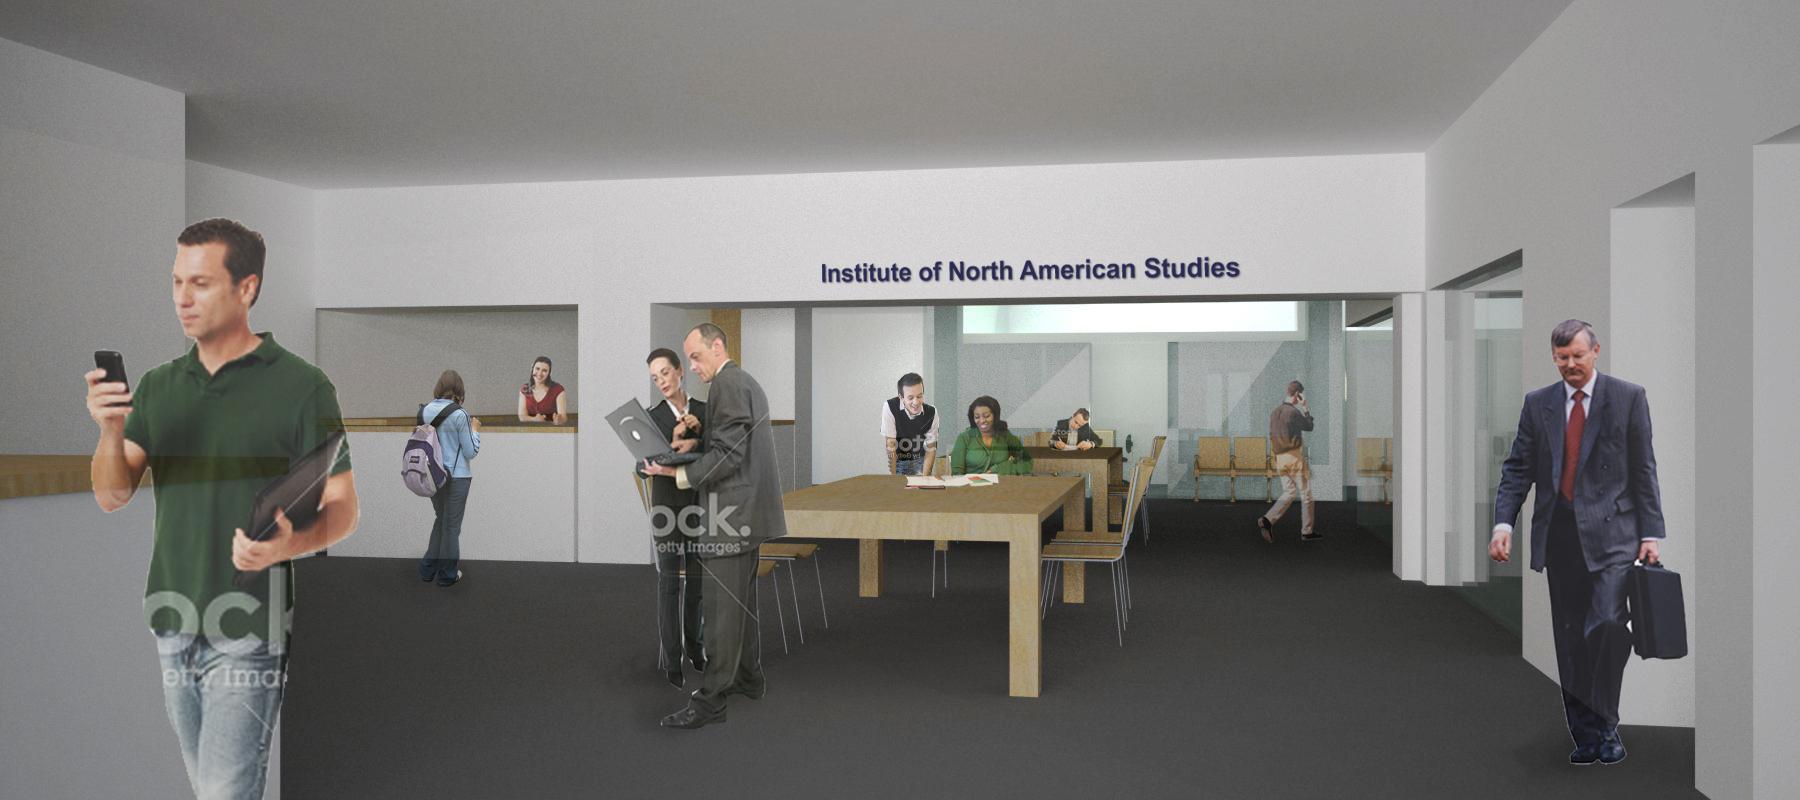 draft reform faade and lobby ien institute for north american studies c aribau barcelona spain emanuele di marzo architect